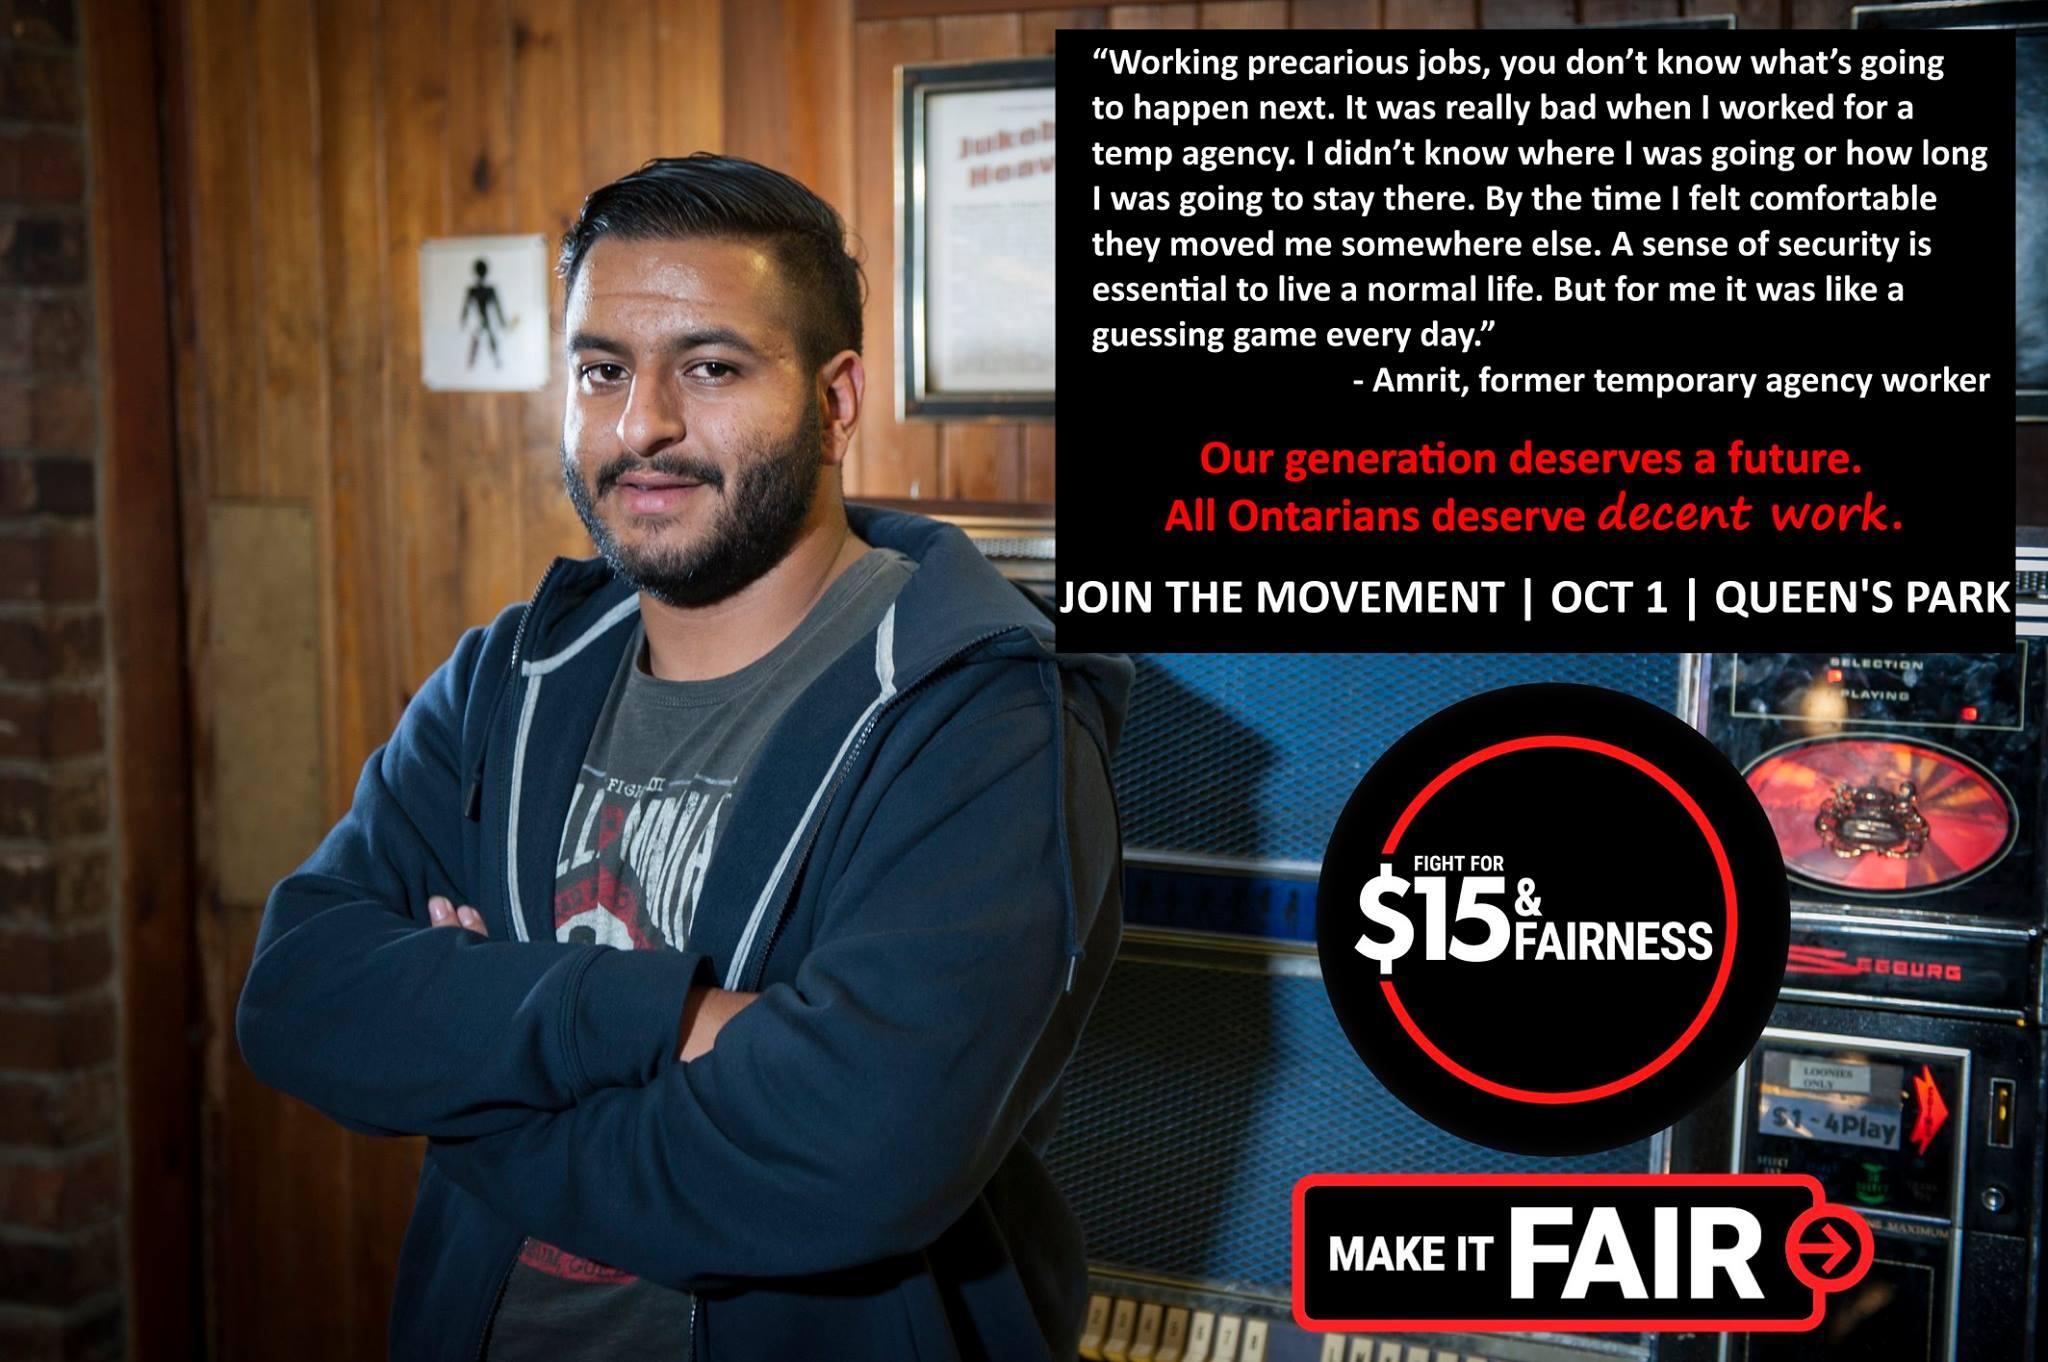 make-it-fair-rally-october-1-2016